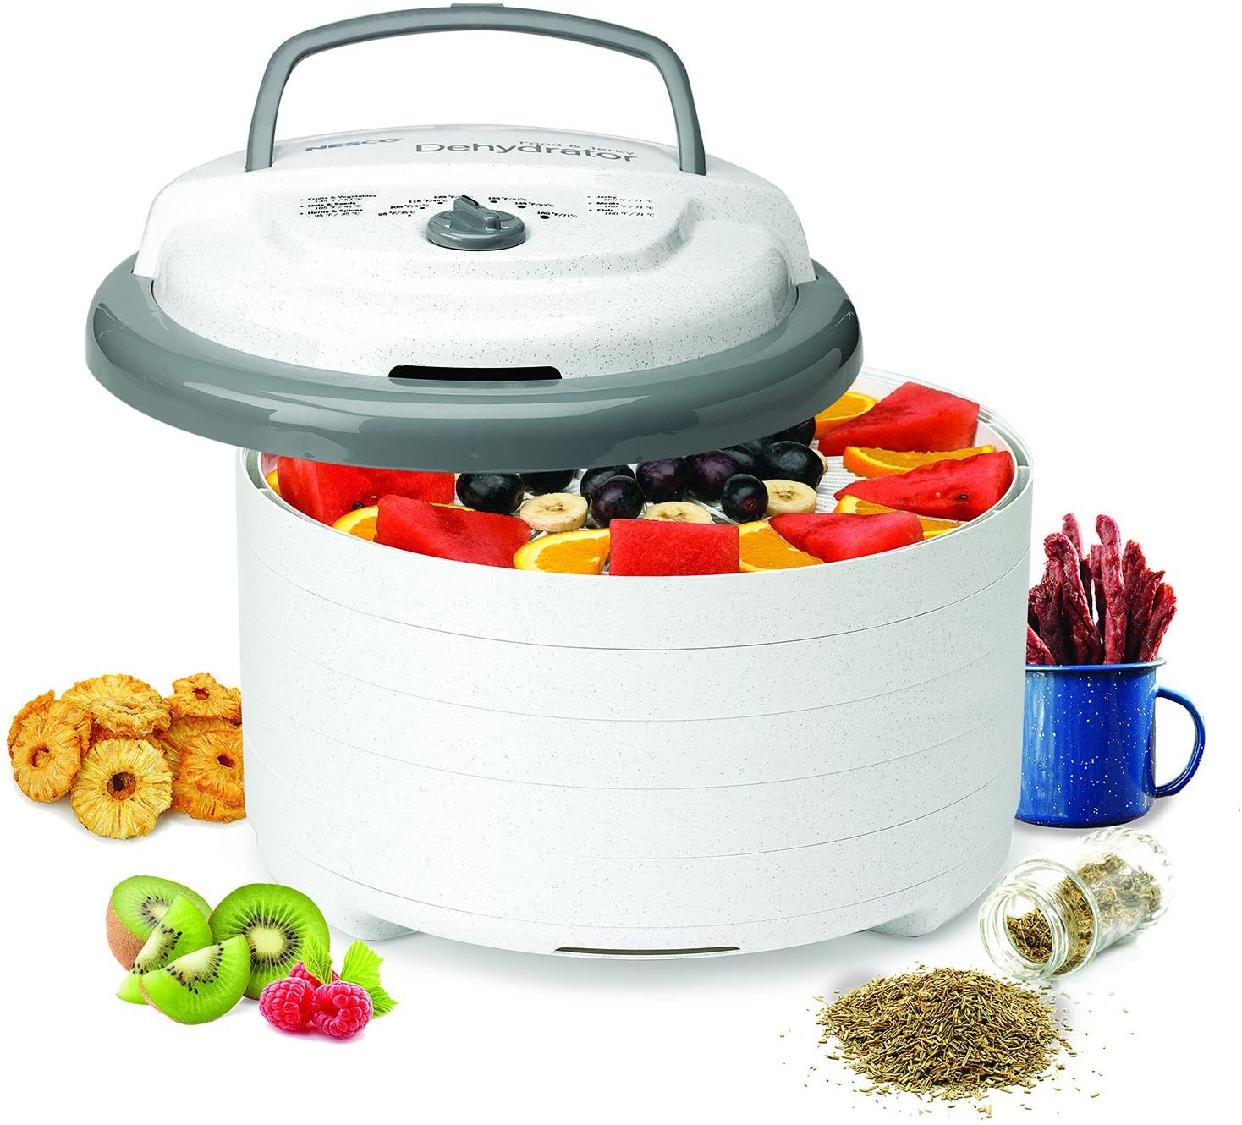 Nesco(ネスコ)スナックマスター 食品乾燥機 FD-75A【並行輸入】の商品画像2